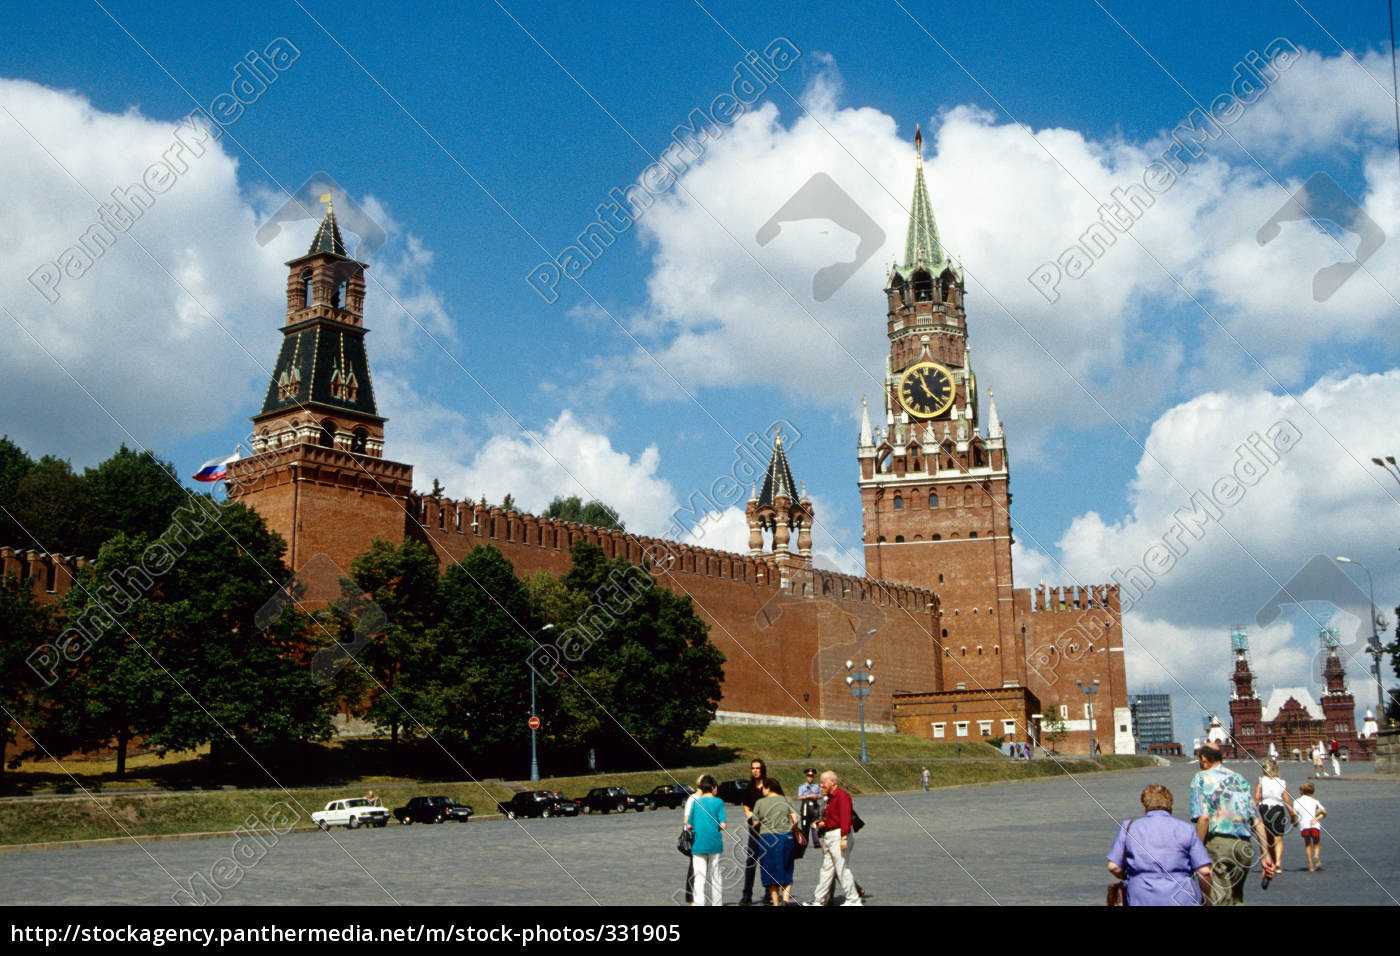 kremlin, red, square - 331905